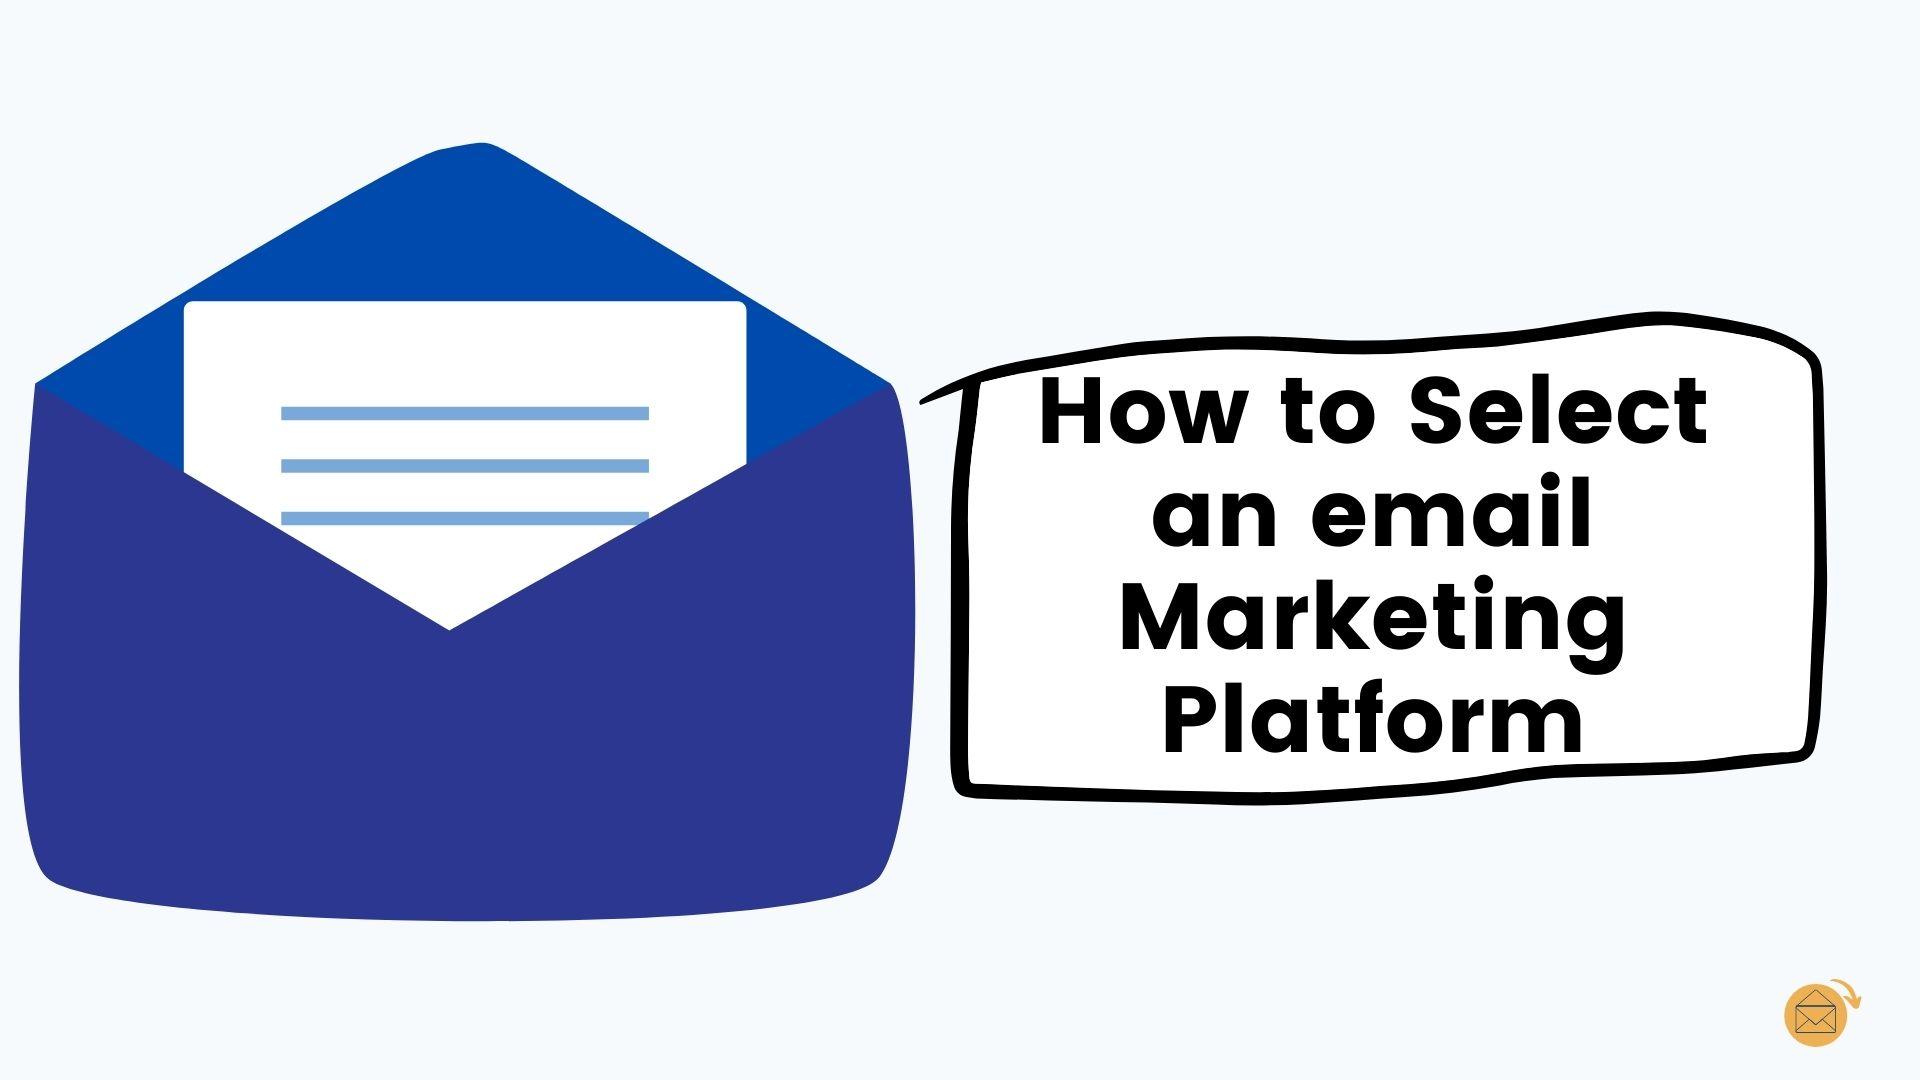 Factors of choosing the best email marketing platform